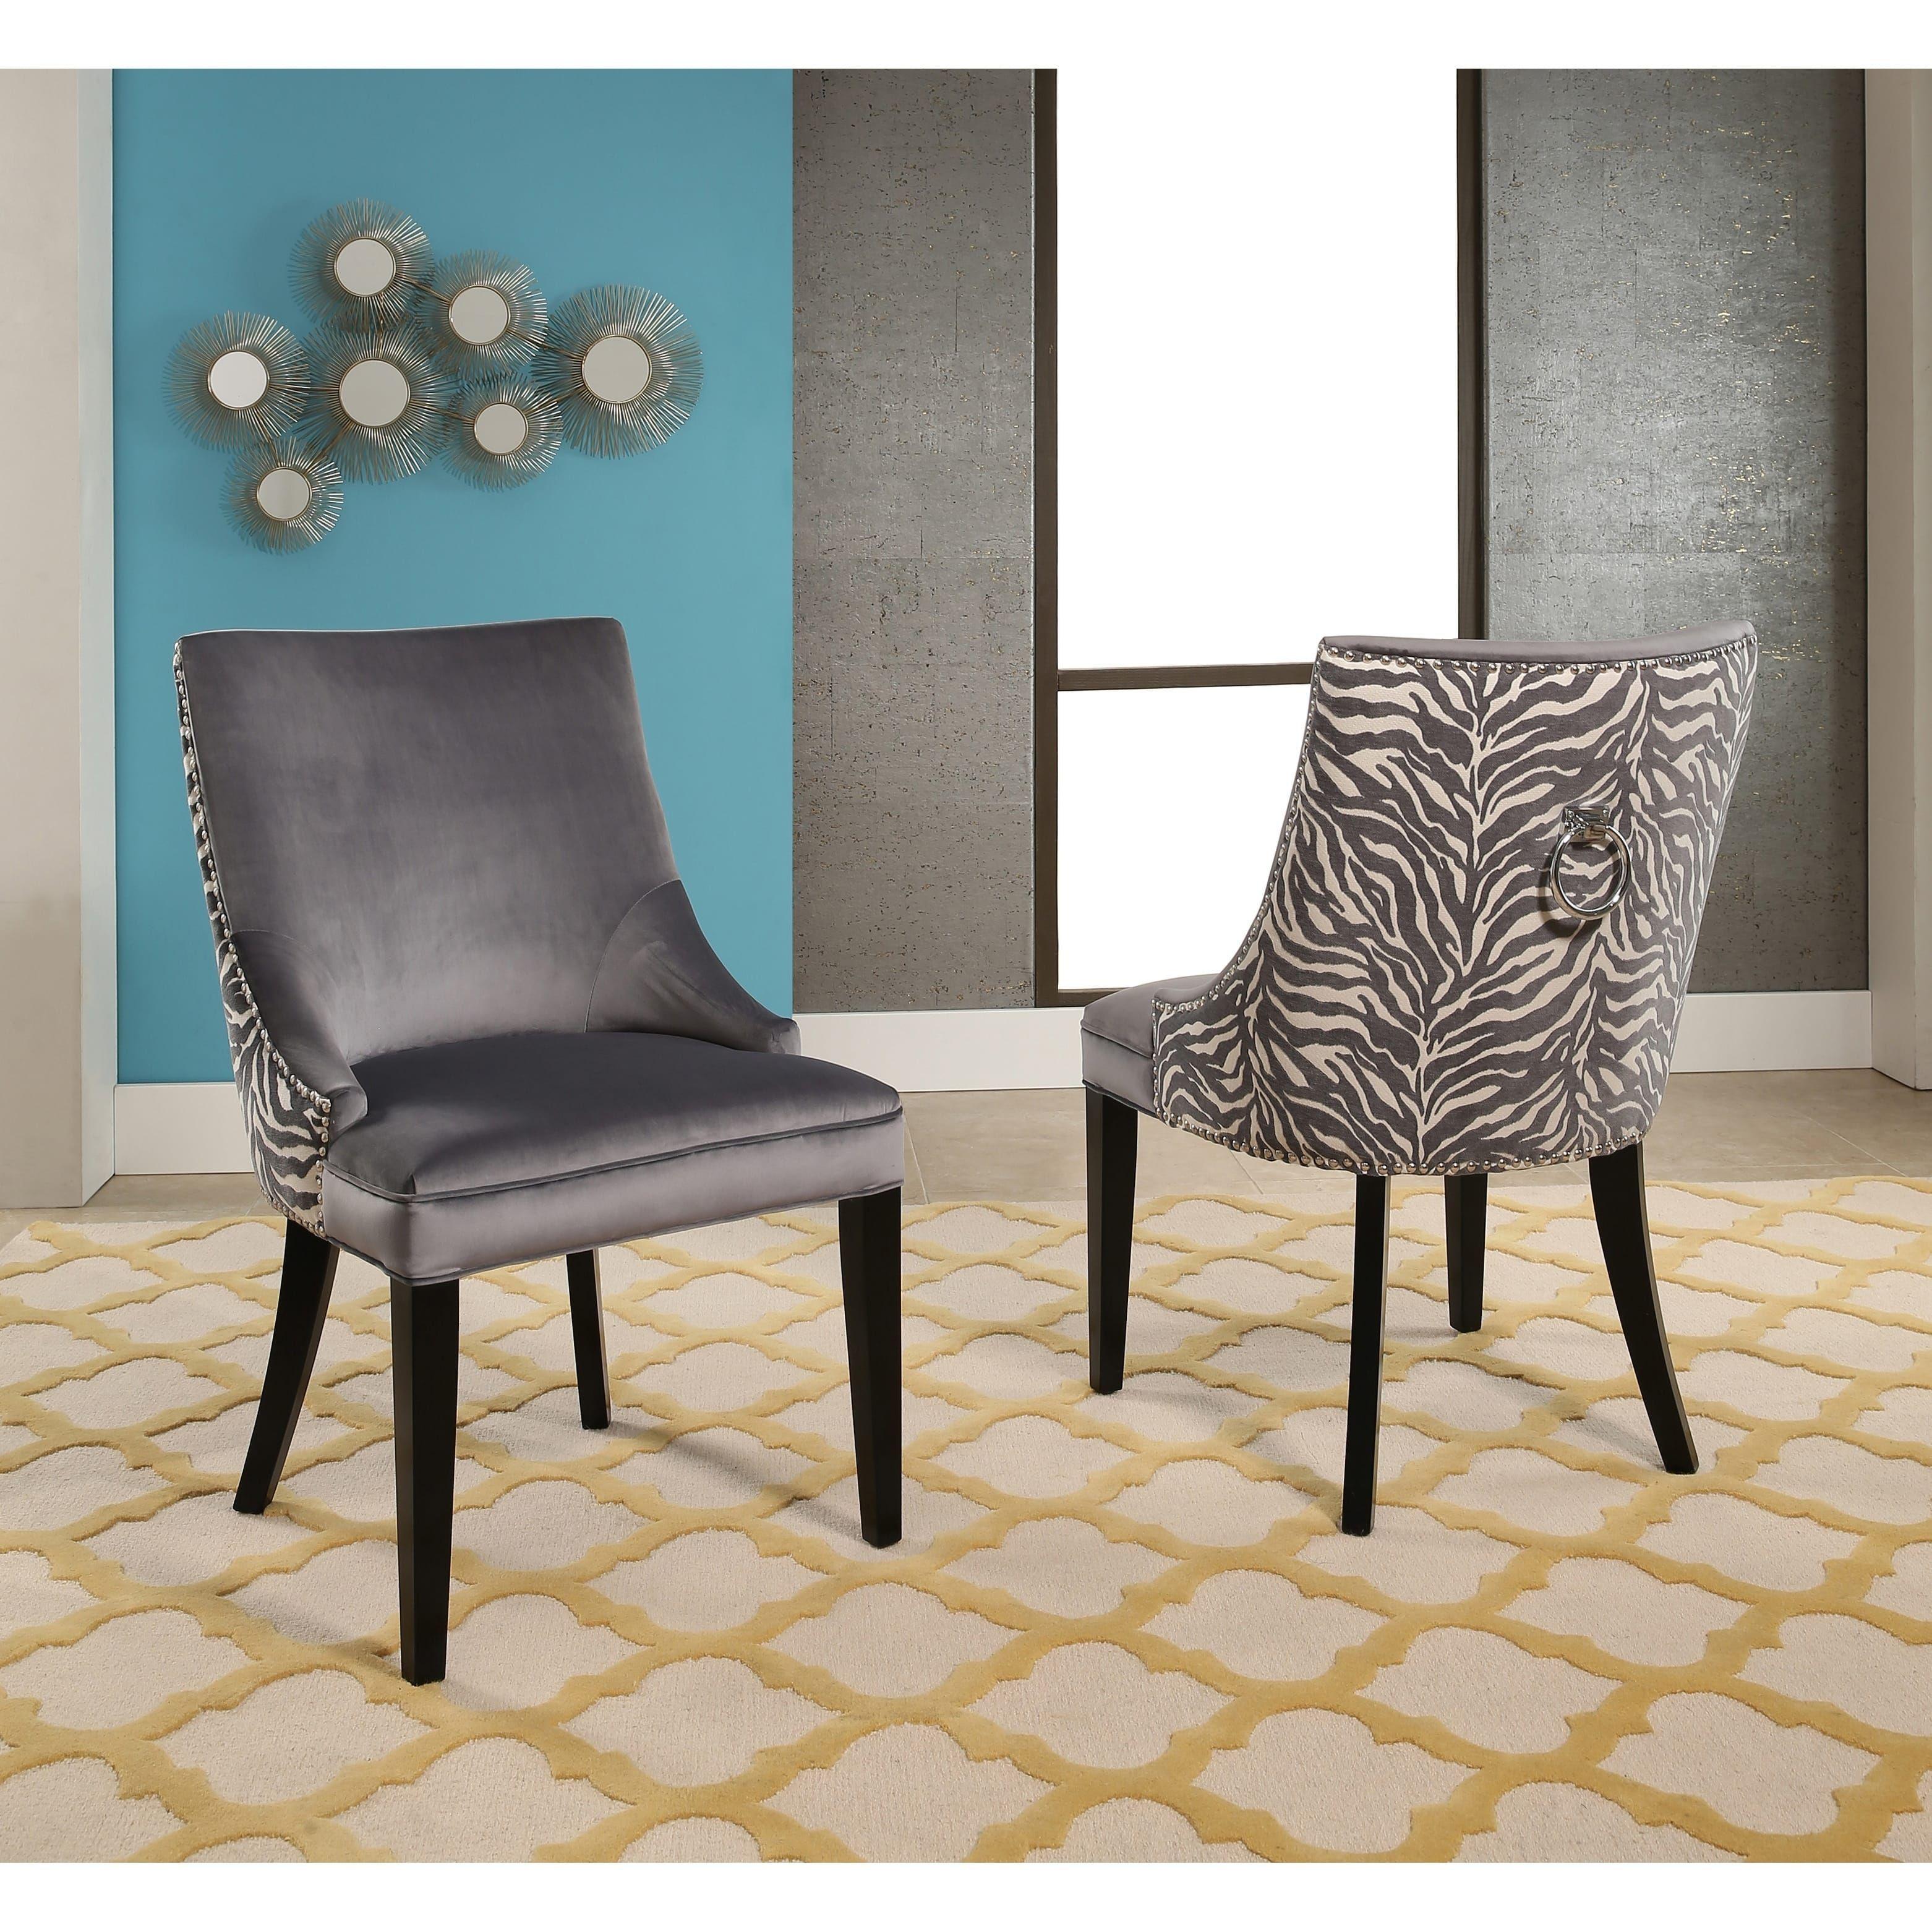 Abbyson Esther Grey Velvet Zebra Dining Chair Set Of 2 Birch